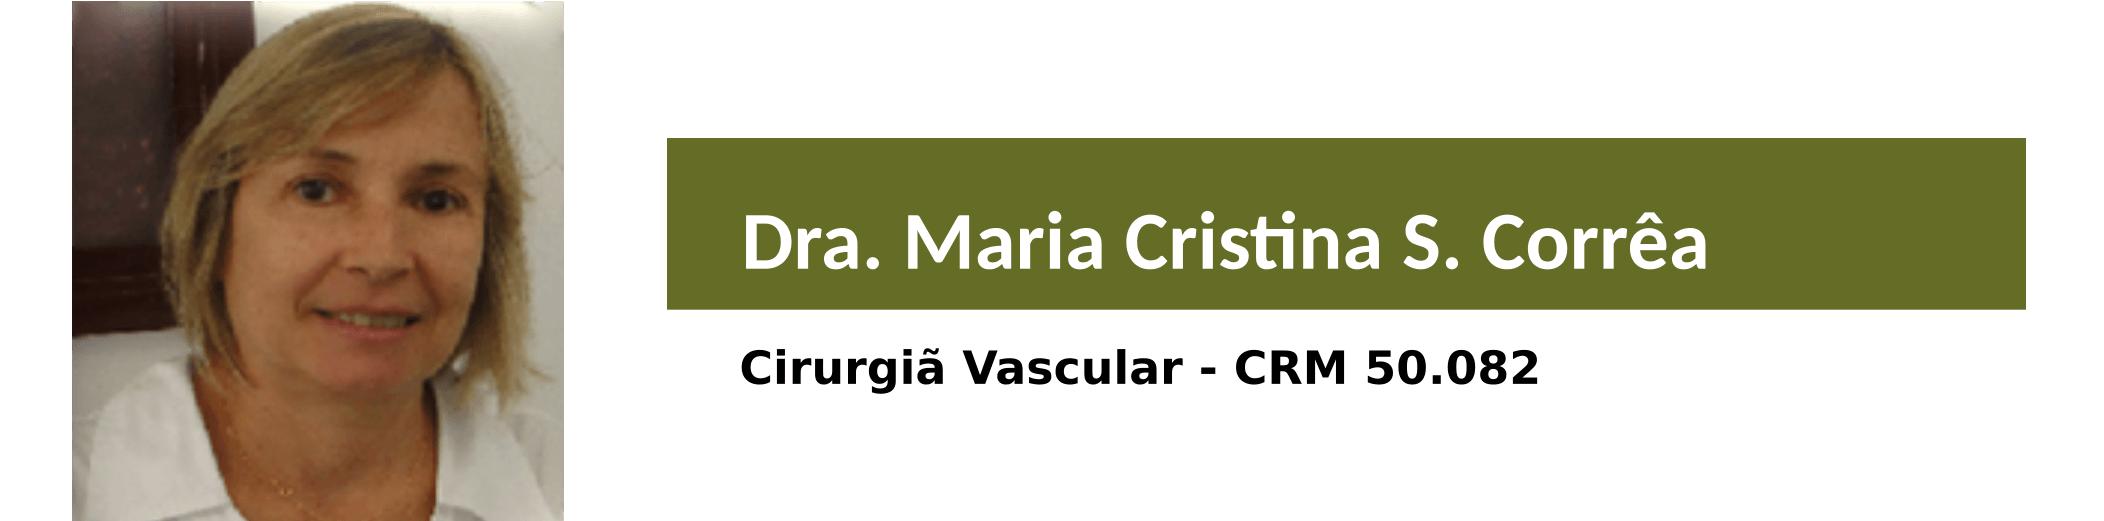 especialista dra maria cristina s correa 080419